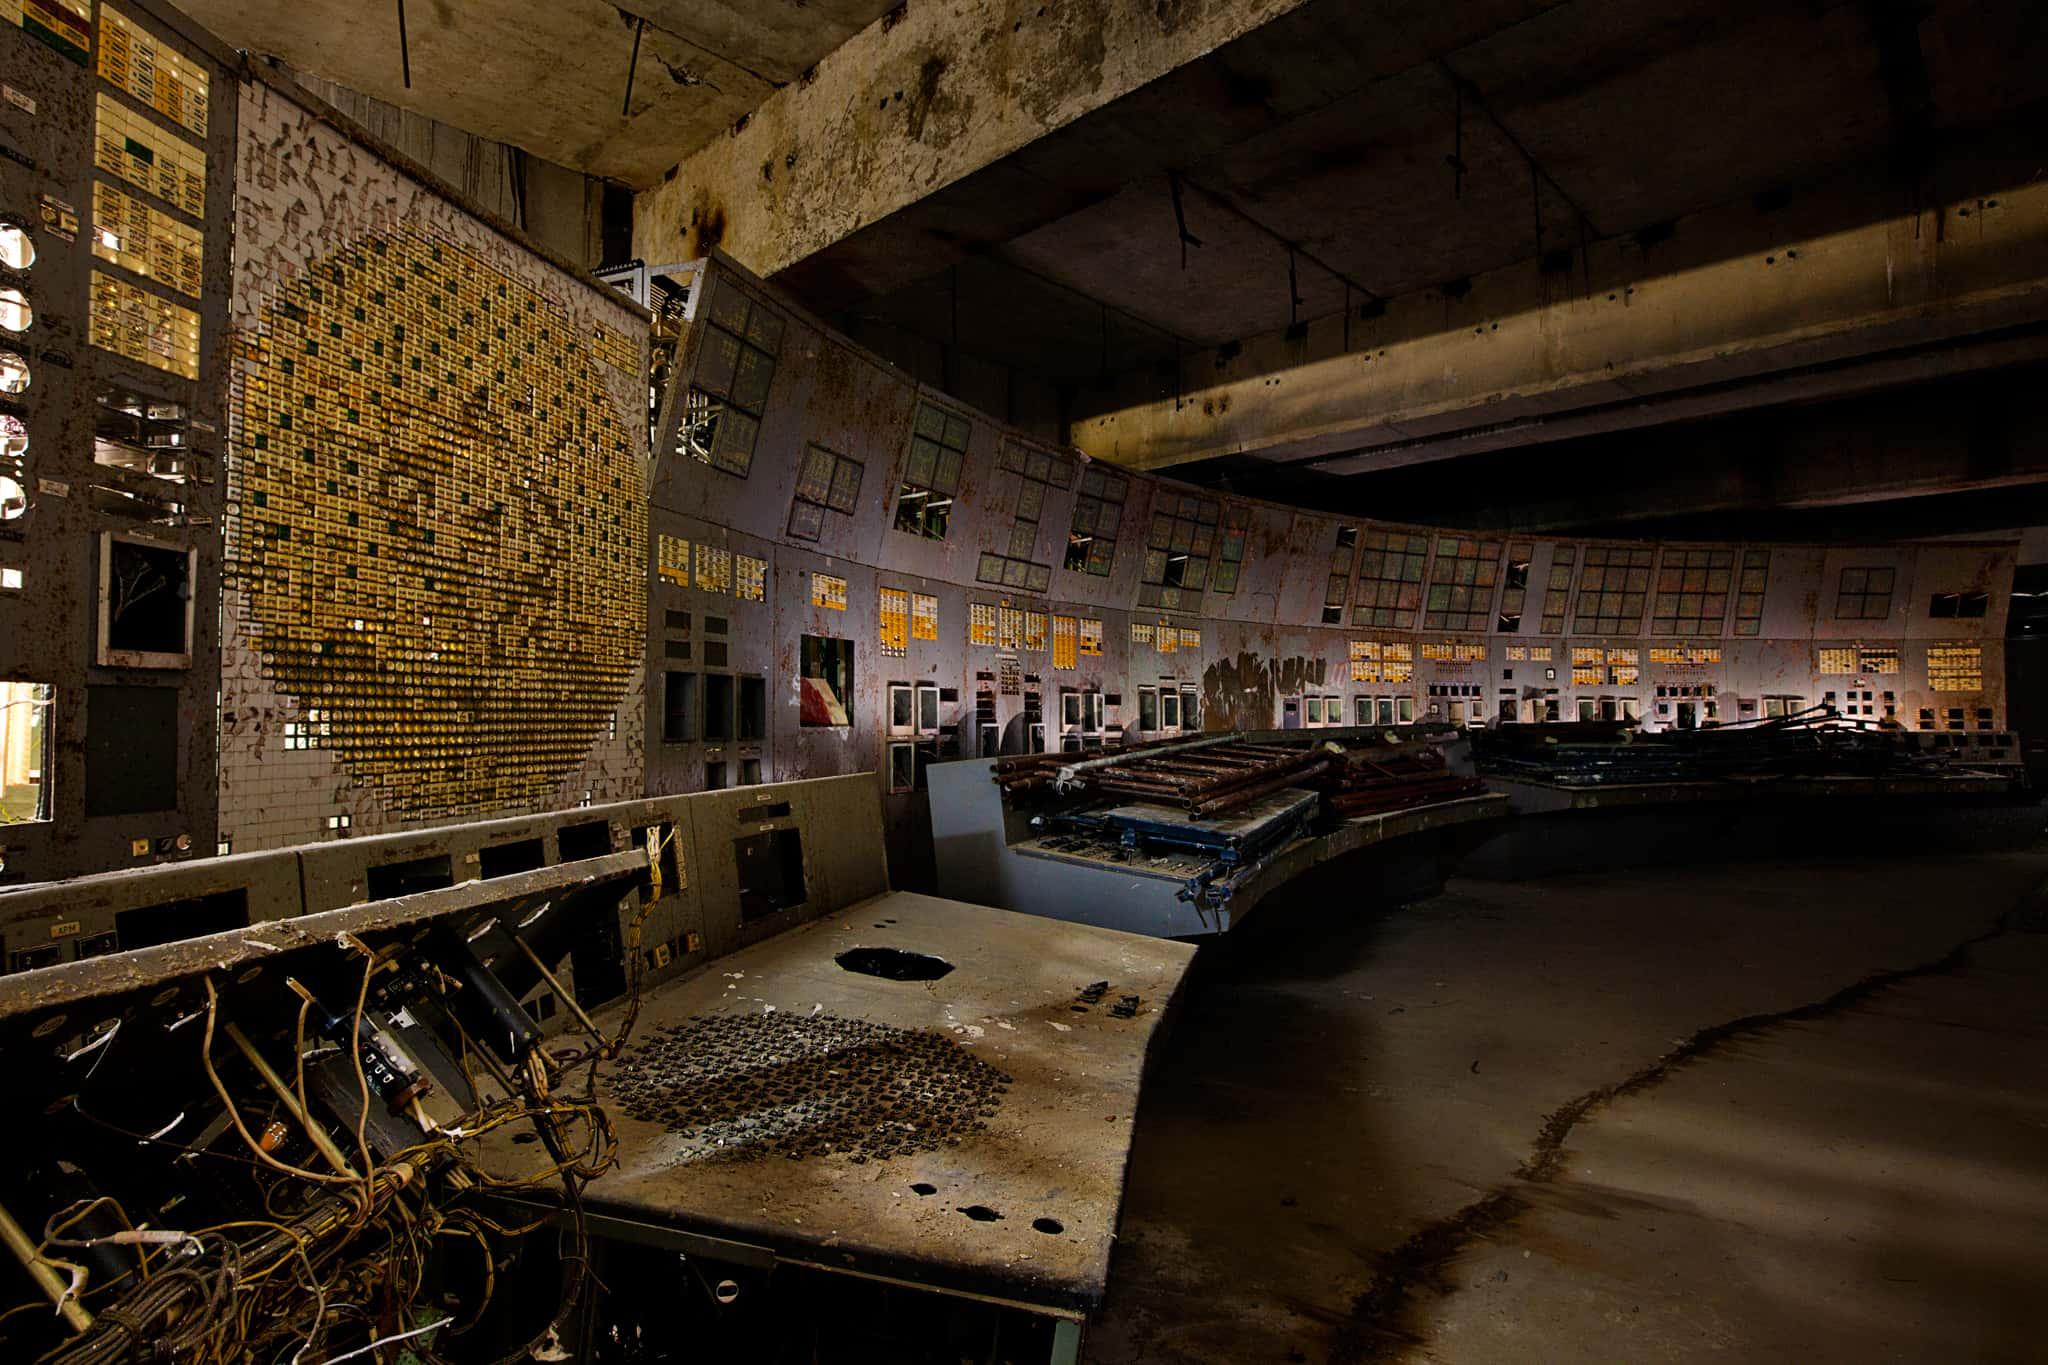 the chernobyl